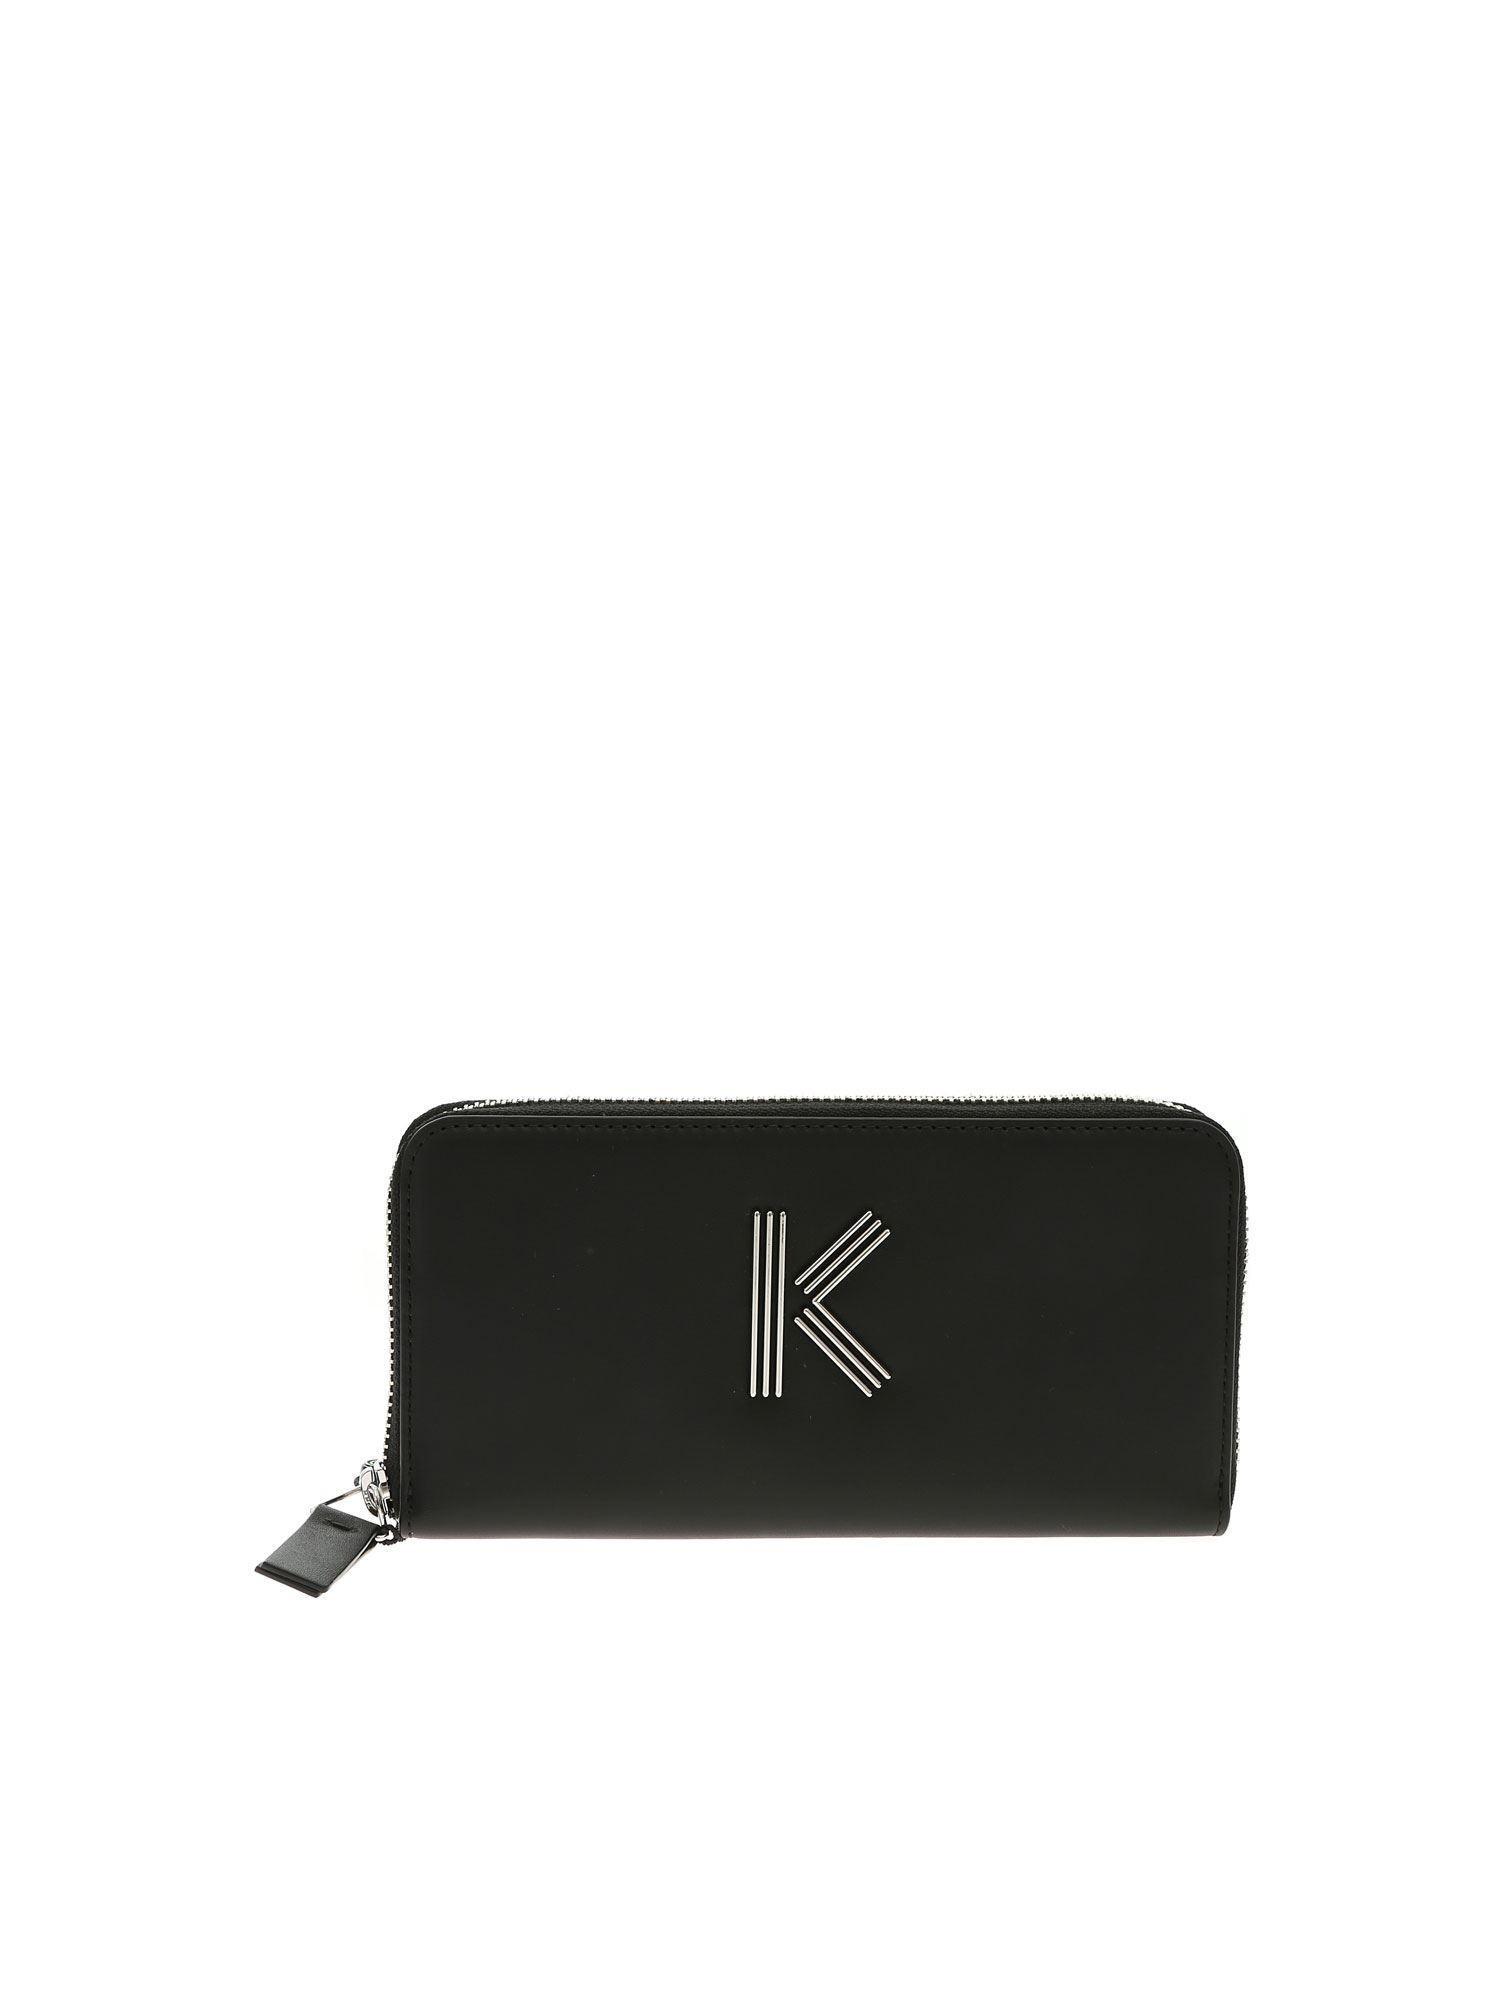 28b29a8804ce KENZO Women s Zip Continental Wallet in Black - Save 7% - Lyst